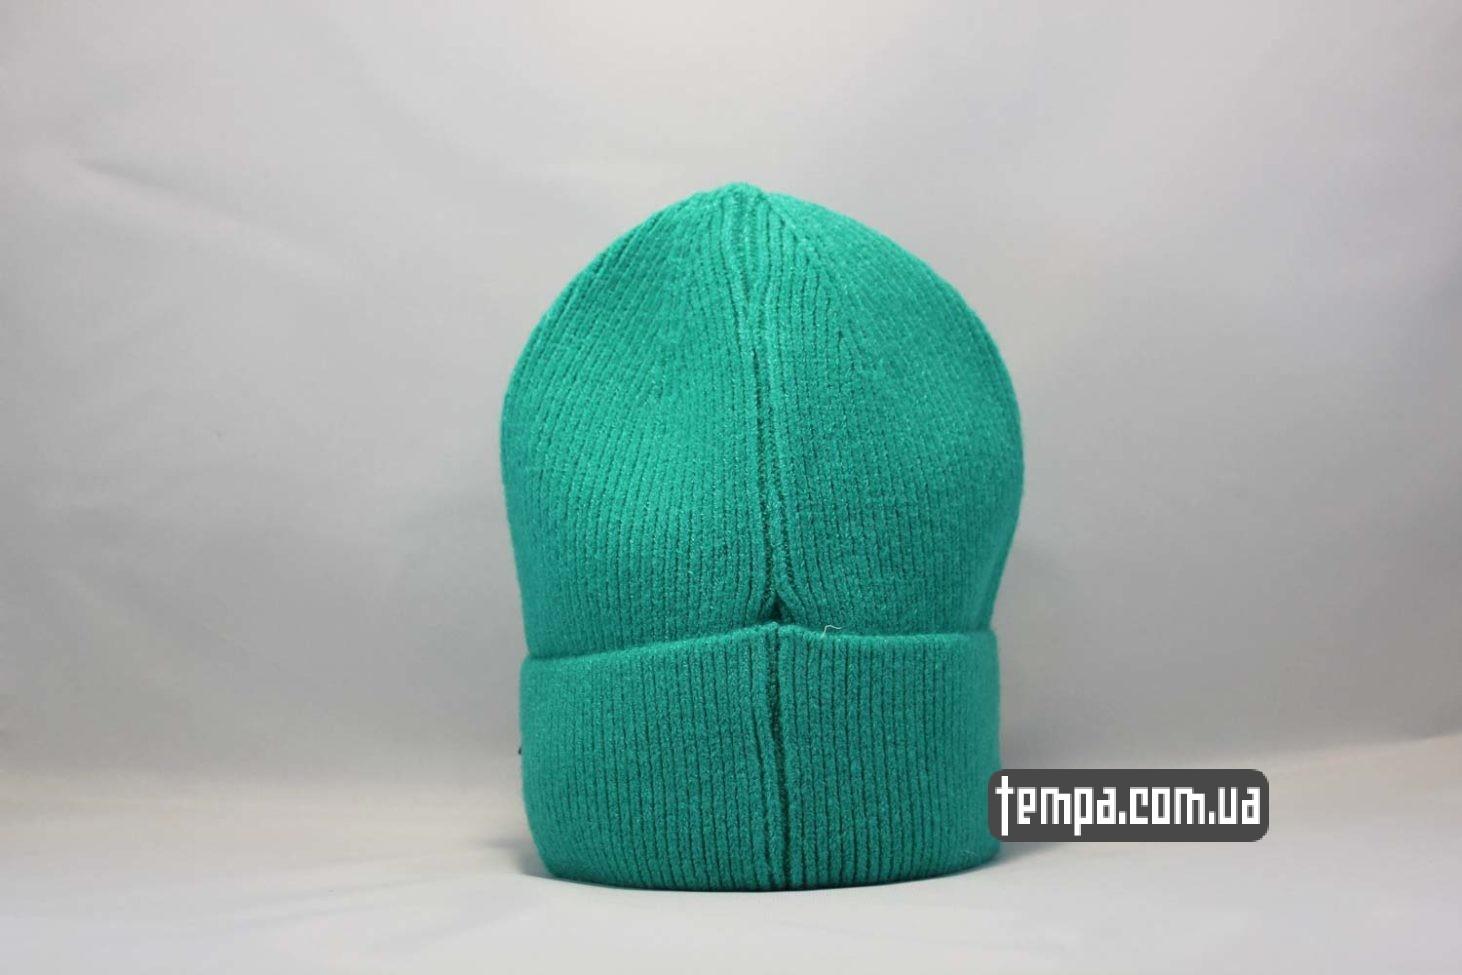 яркая салатовая шапка beanie Champion green зеленая купить Украина